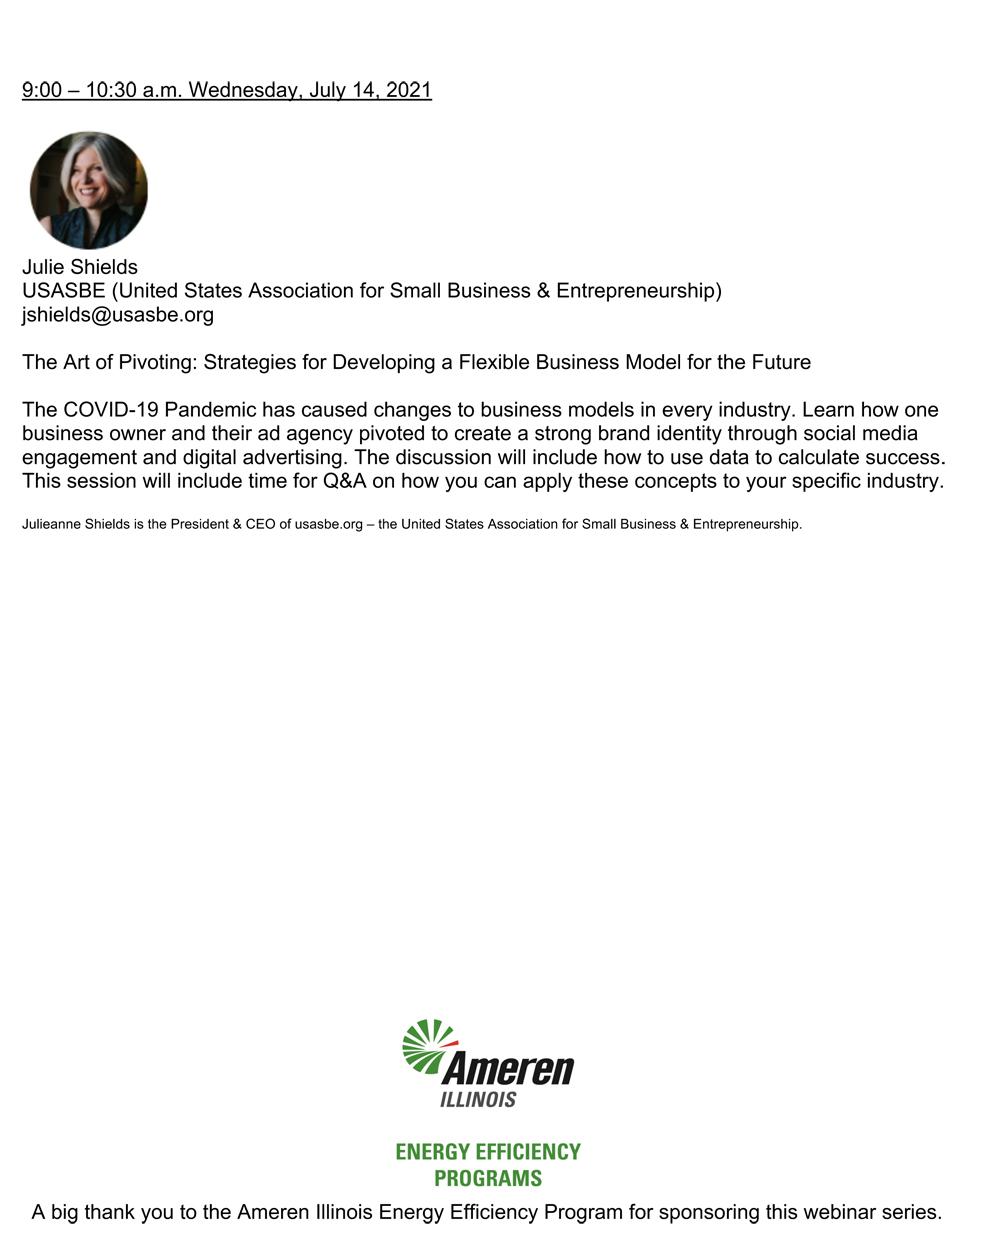 Tools for Success Webinar July 14, 2021